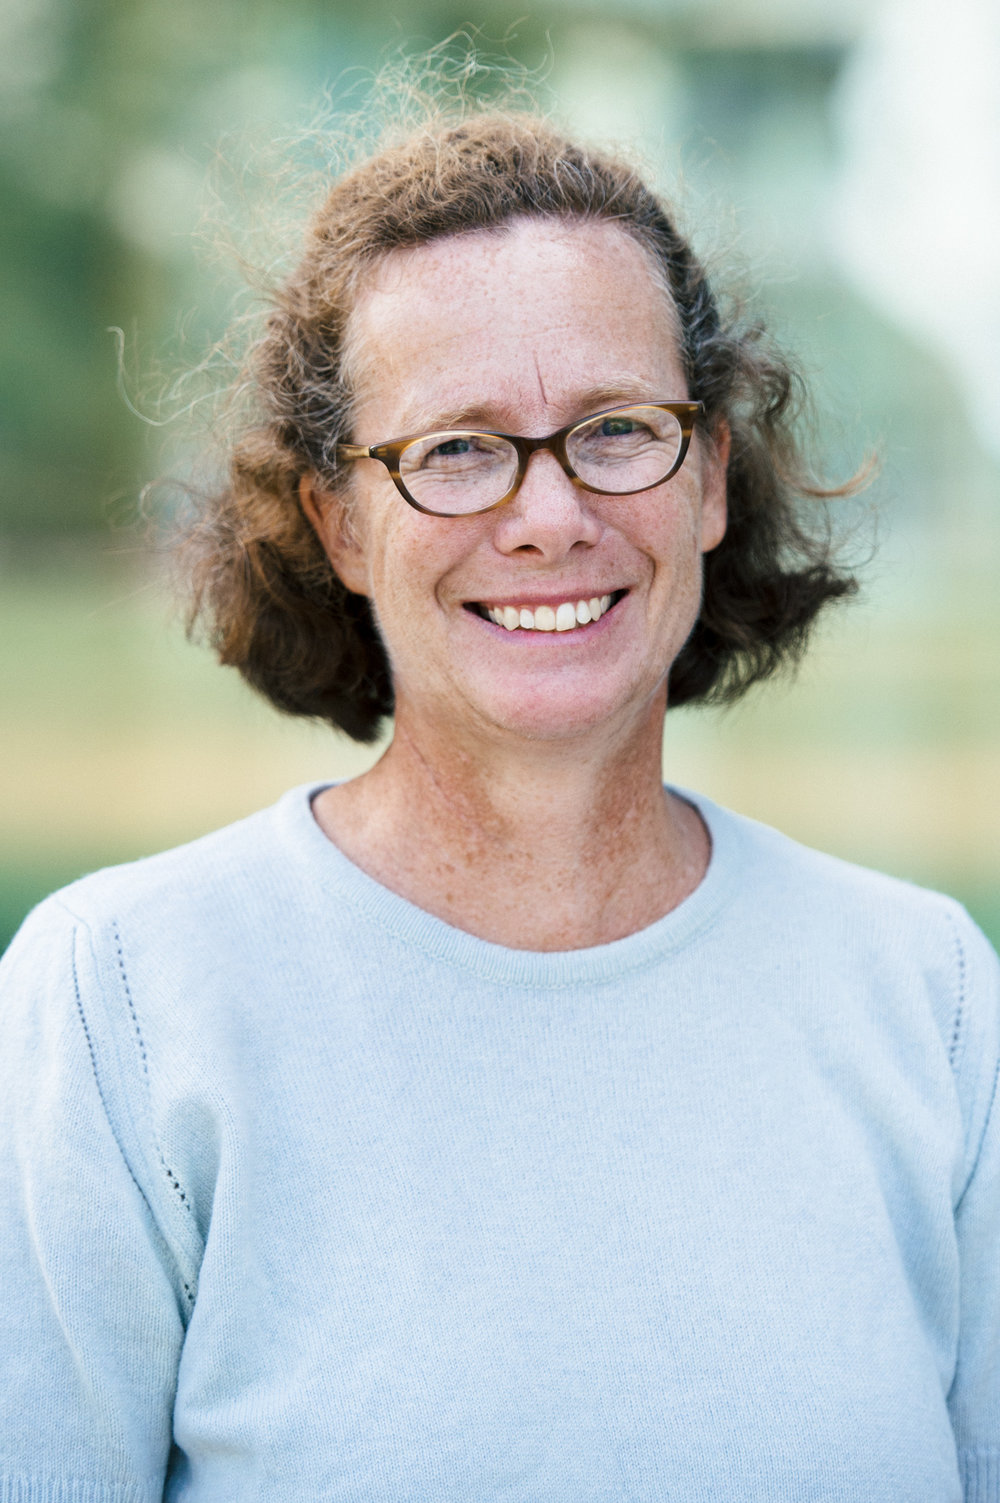 Molly Konopka